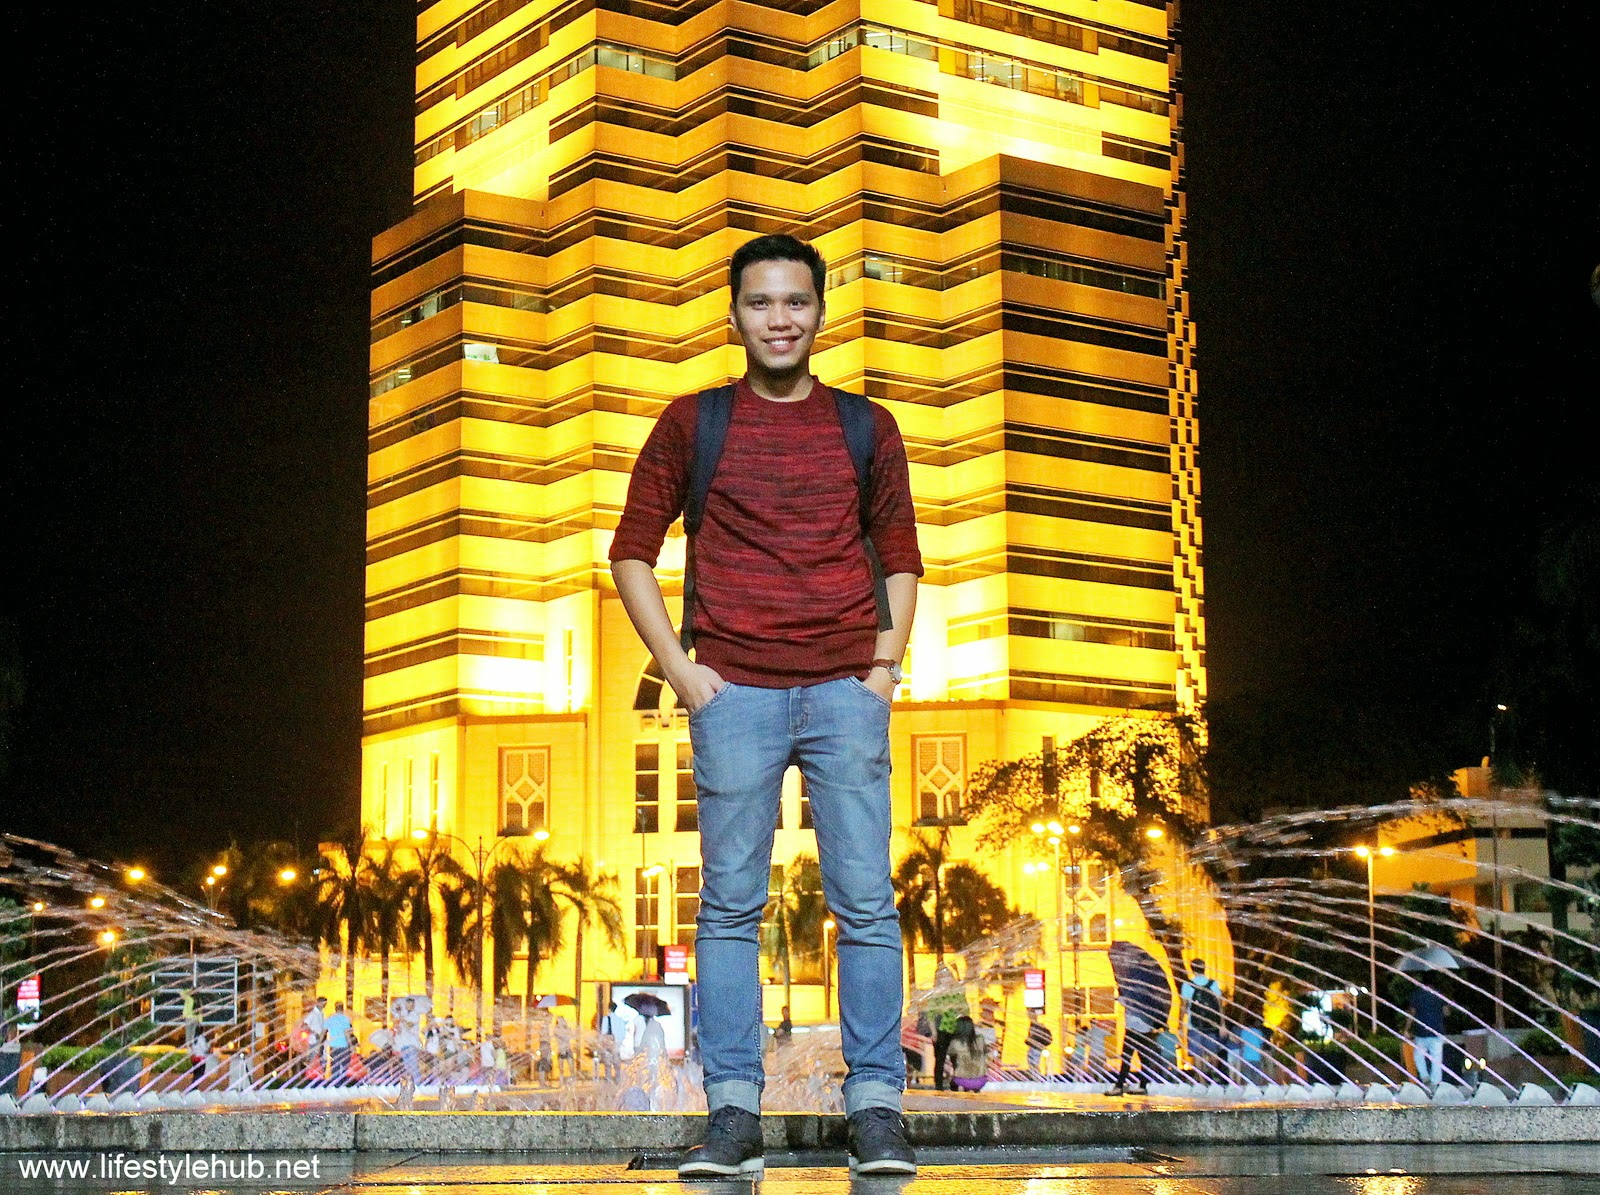 2015 travel wish list